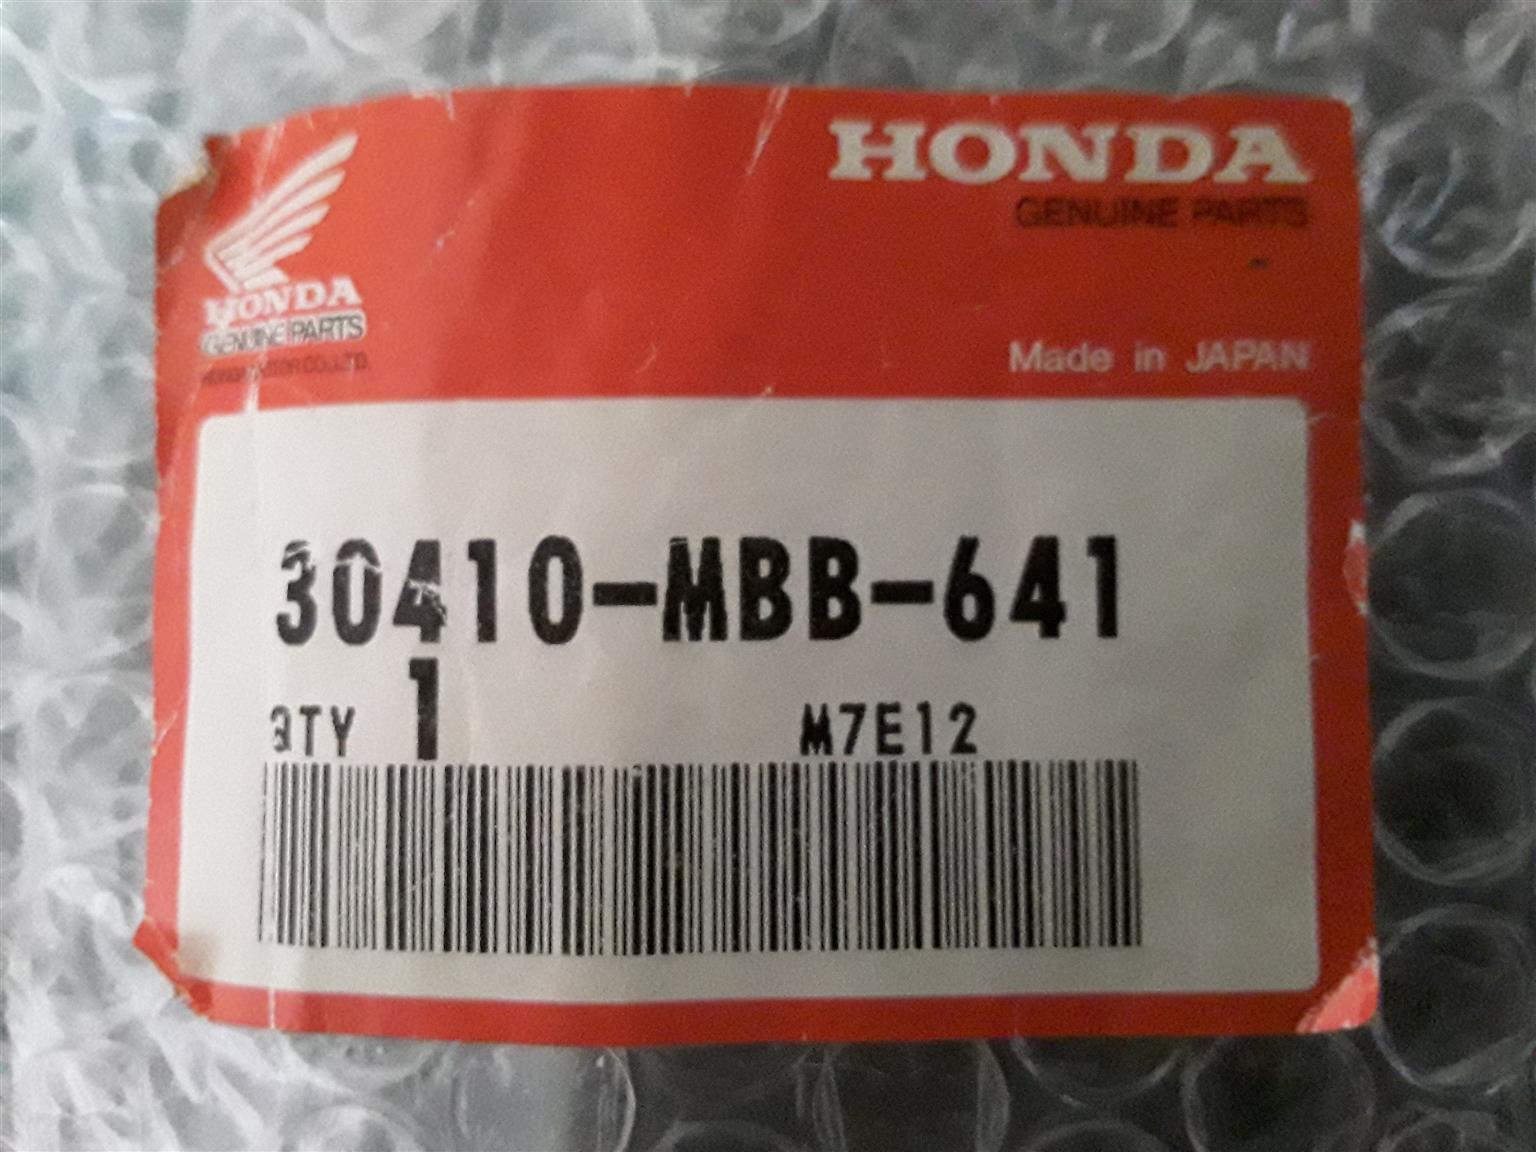 Honda VTR1000F ECU/spark unit